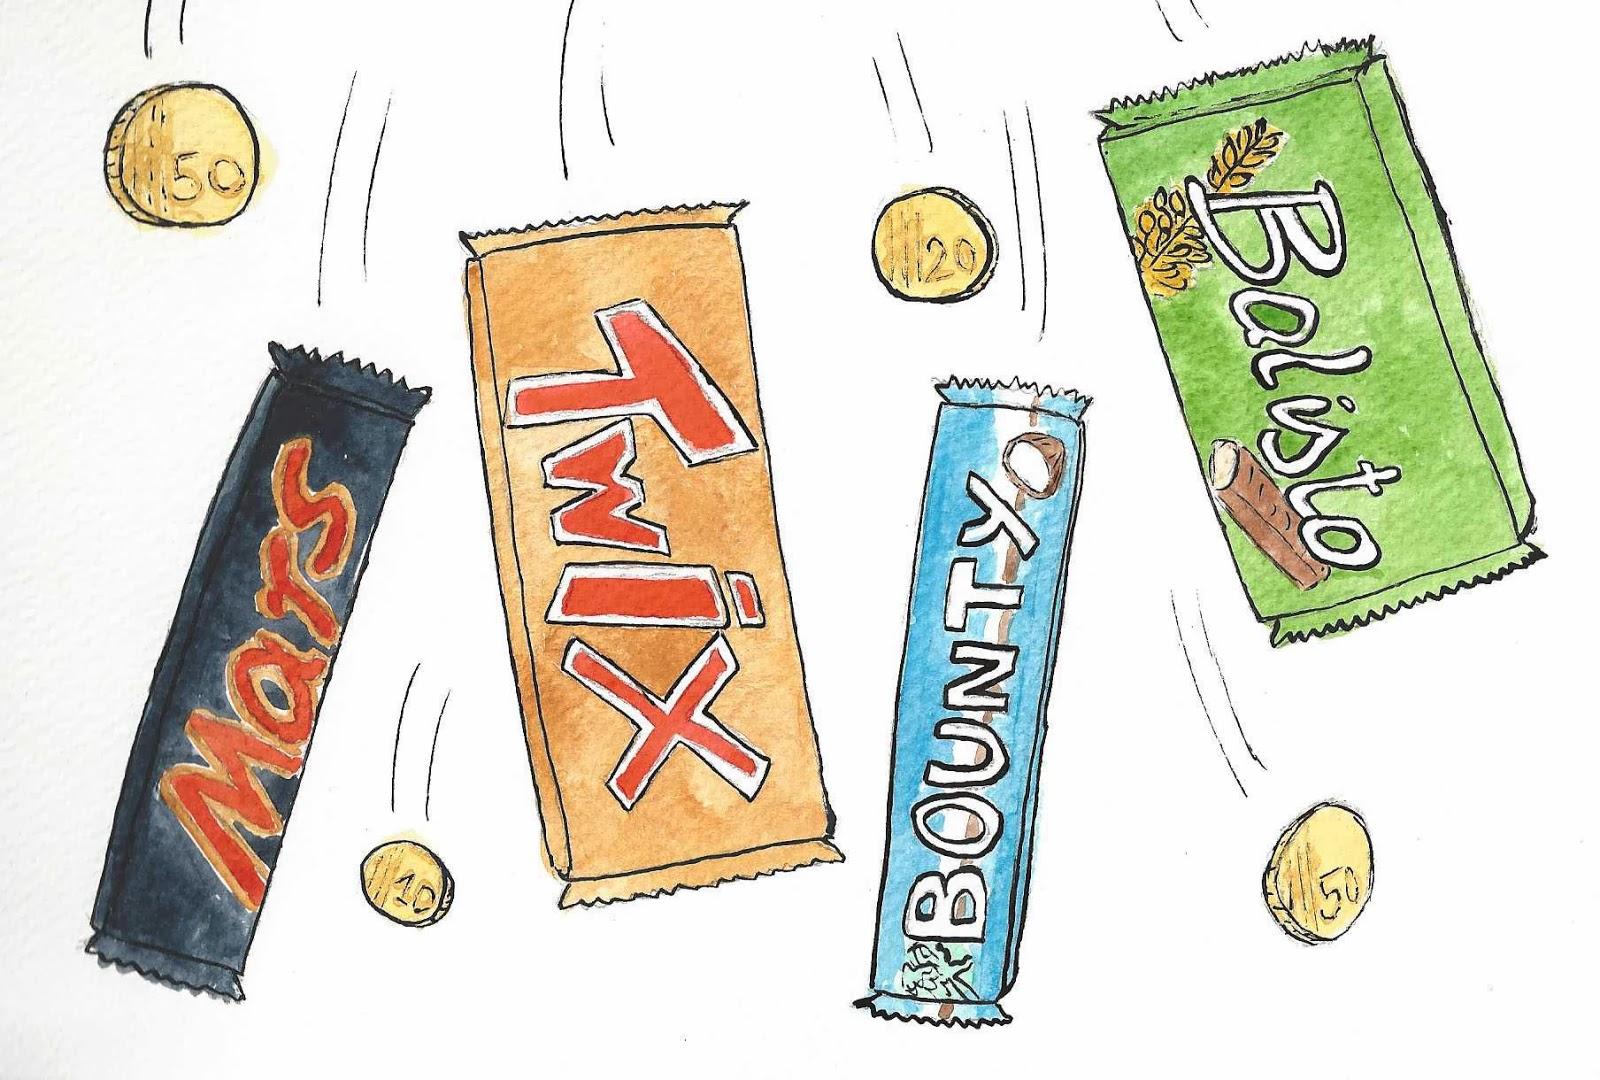 Mars, Twix, Balisto, Bounty... Oh oui!